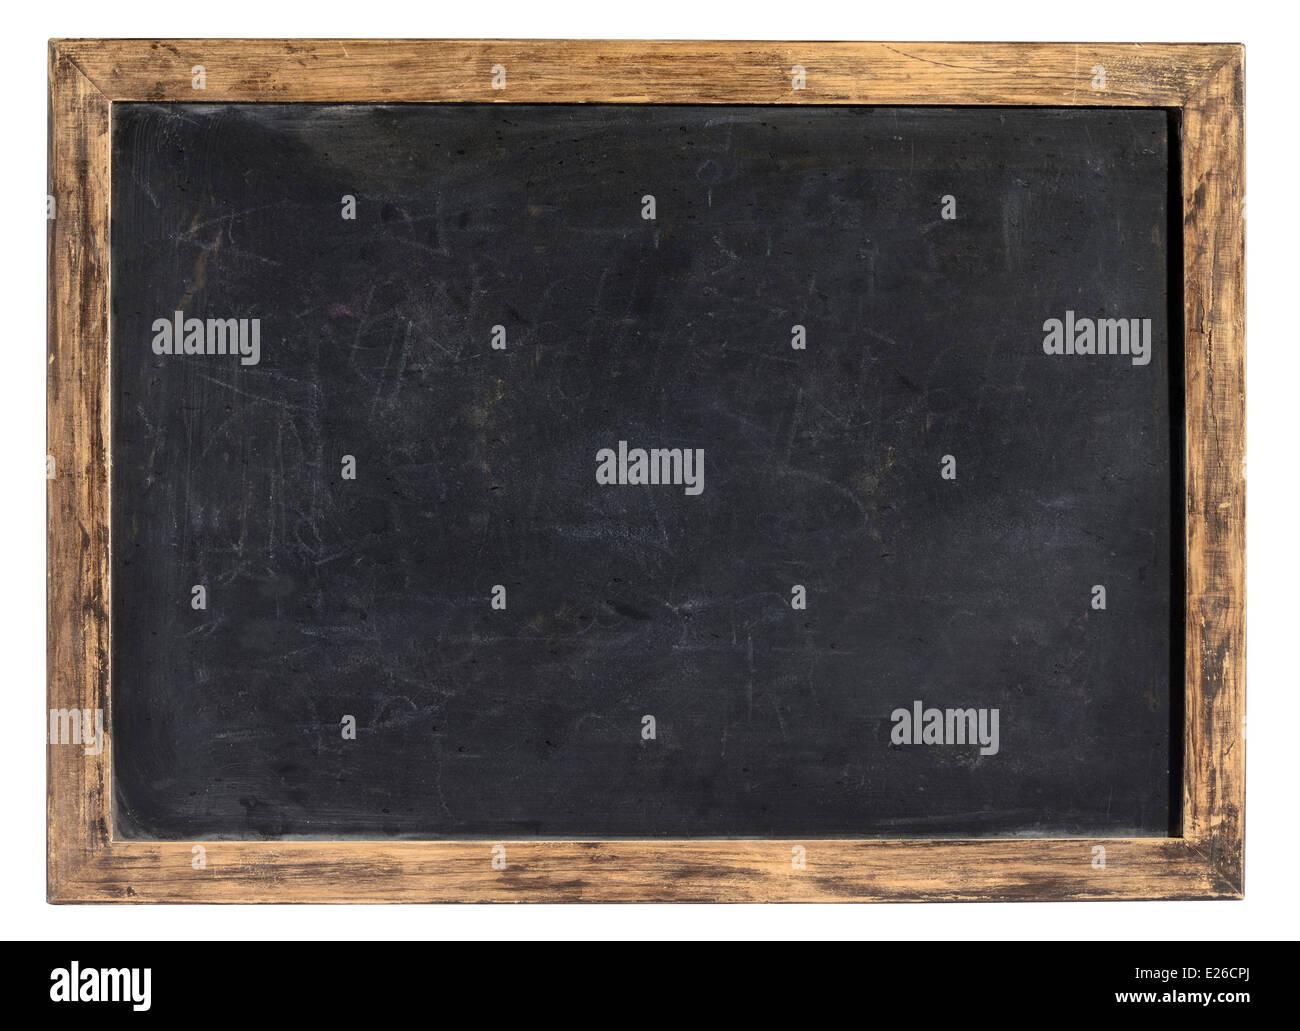 Vintage blackboard or school slate - Stock Image